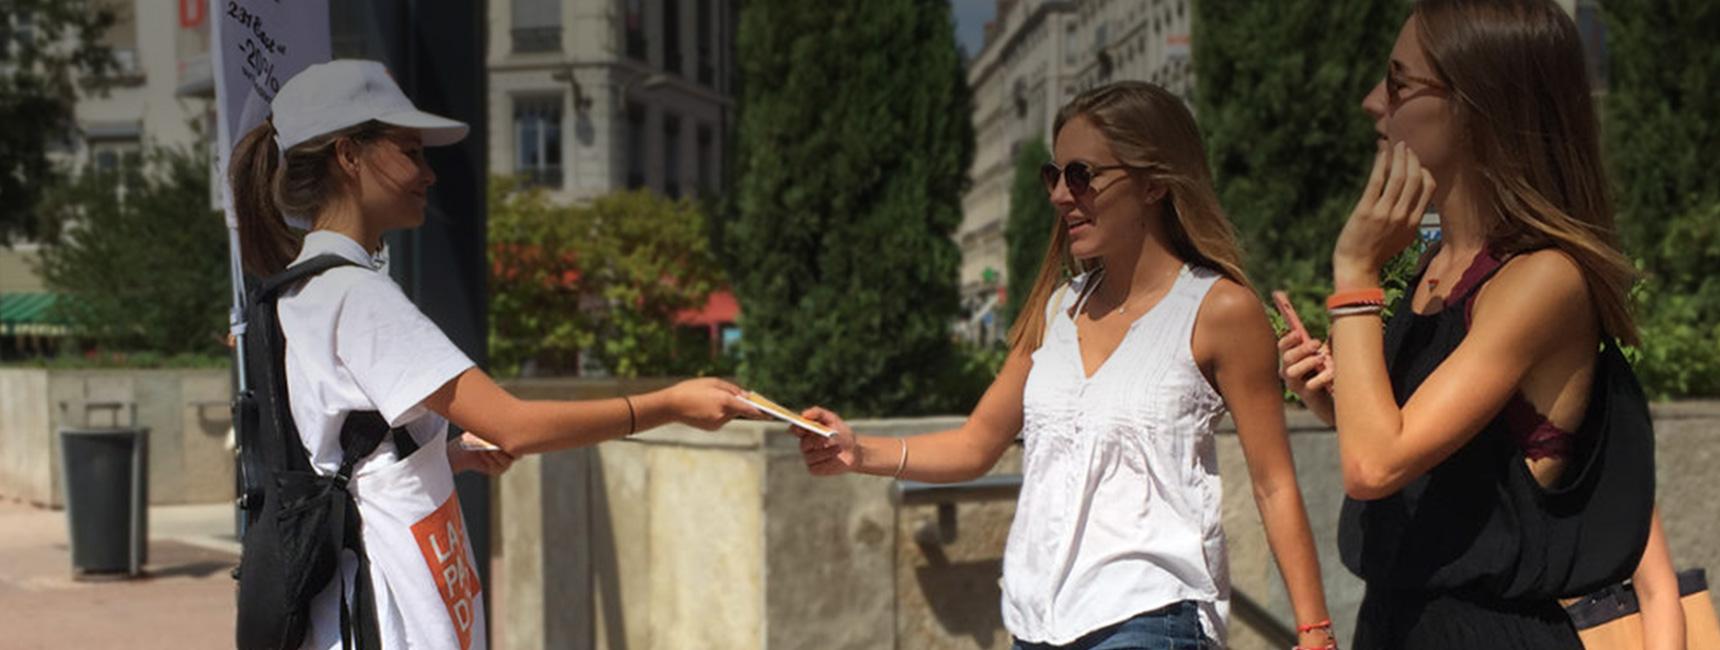 La Part Dieu Street Marketing Diffusion Keemia Lyon Agence marketing local en région Rhônes Alpes